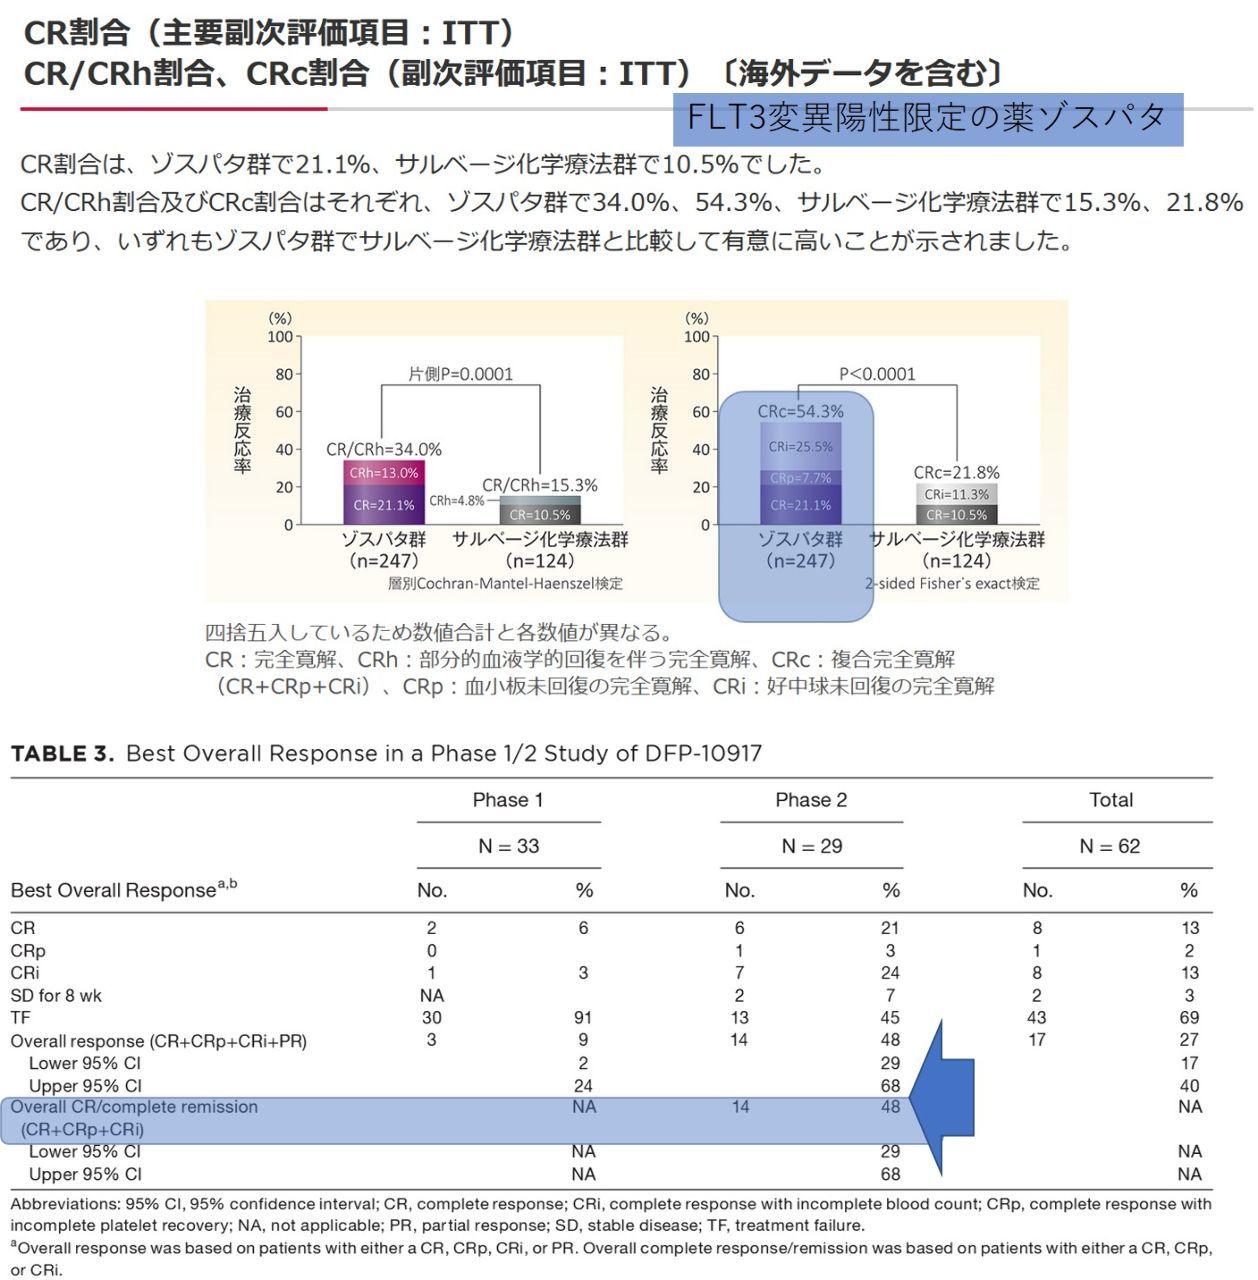 4598 - Delta-Fly Pharma(株) それもちょっと違っていて ゾスパタの34%というのは、 CR:完全寛解+CRh:部分的血液学的回復を